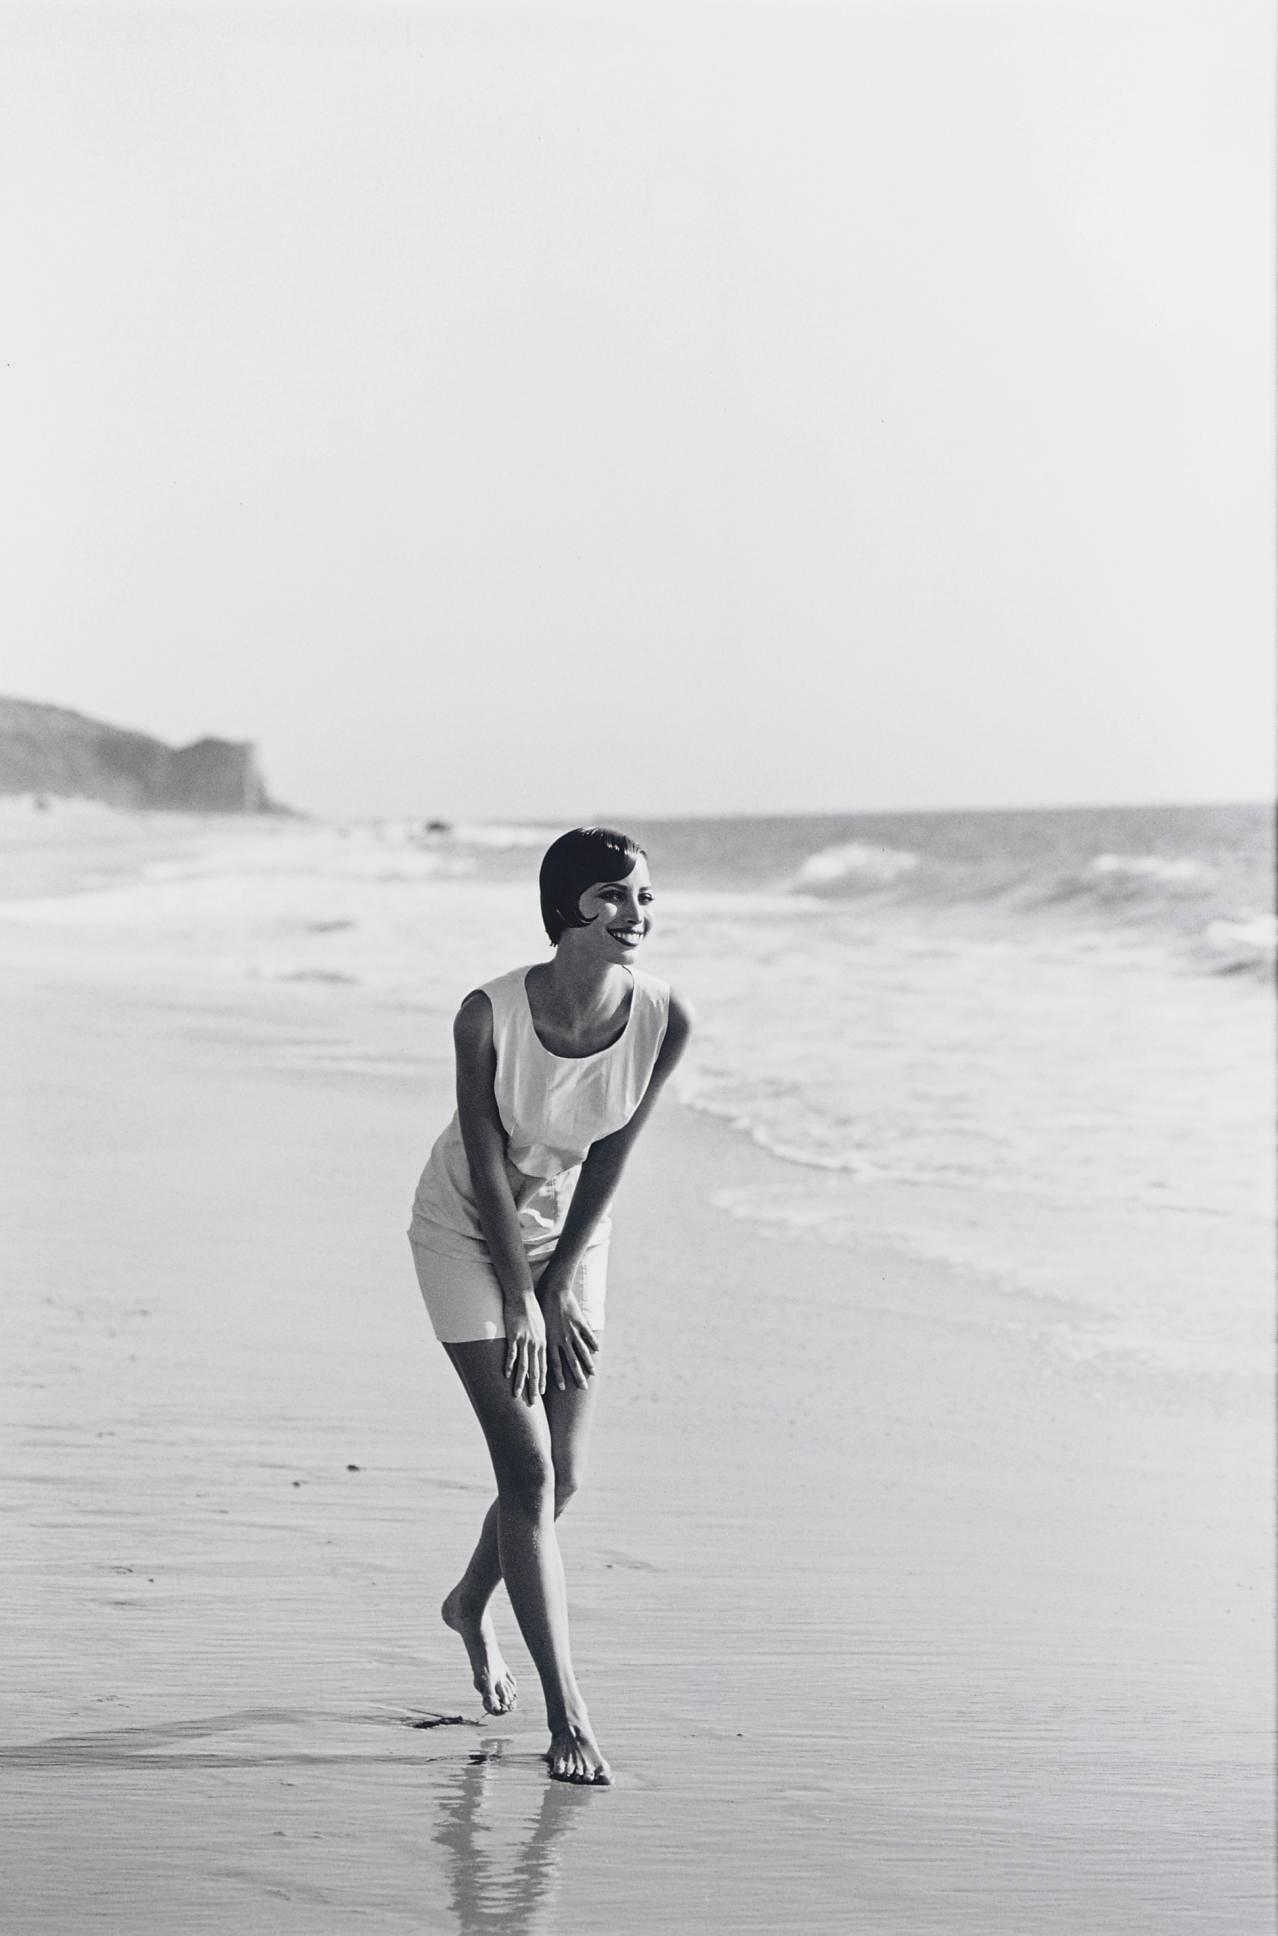 Christy Turlington, Malibu, for Alberta Aspesi, 1991